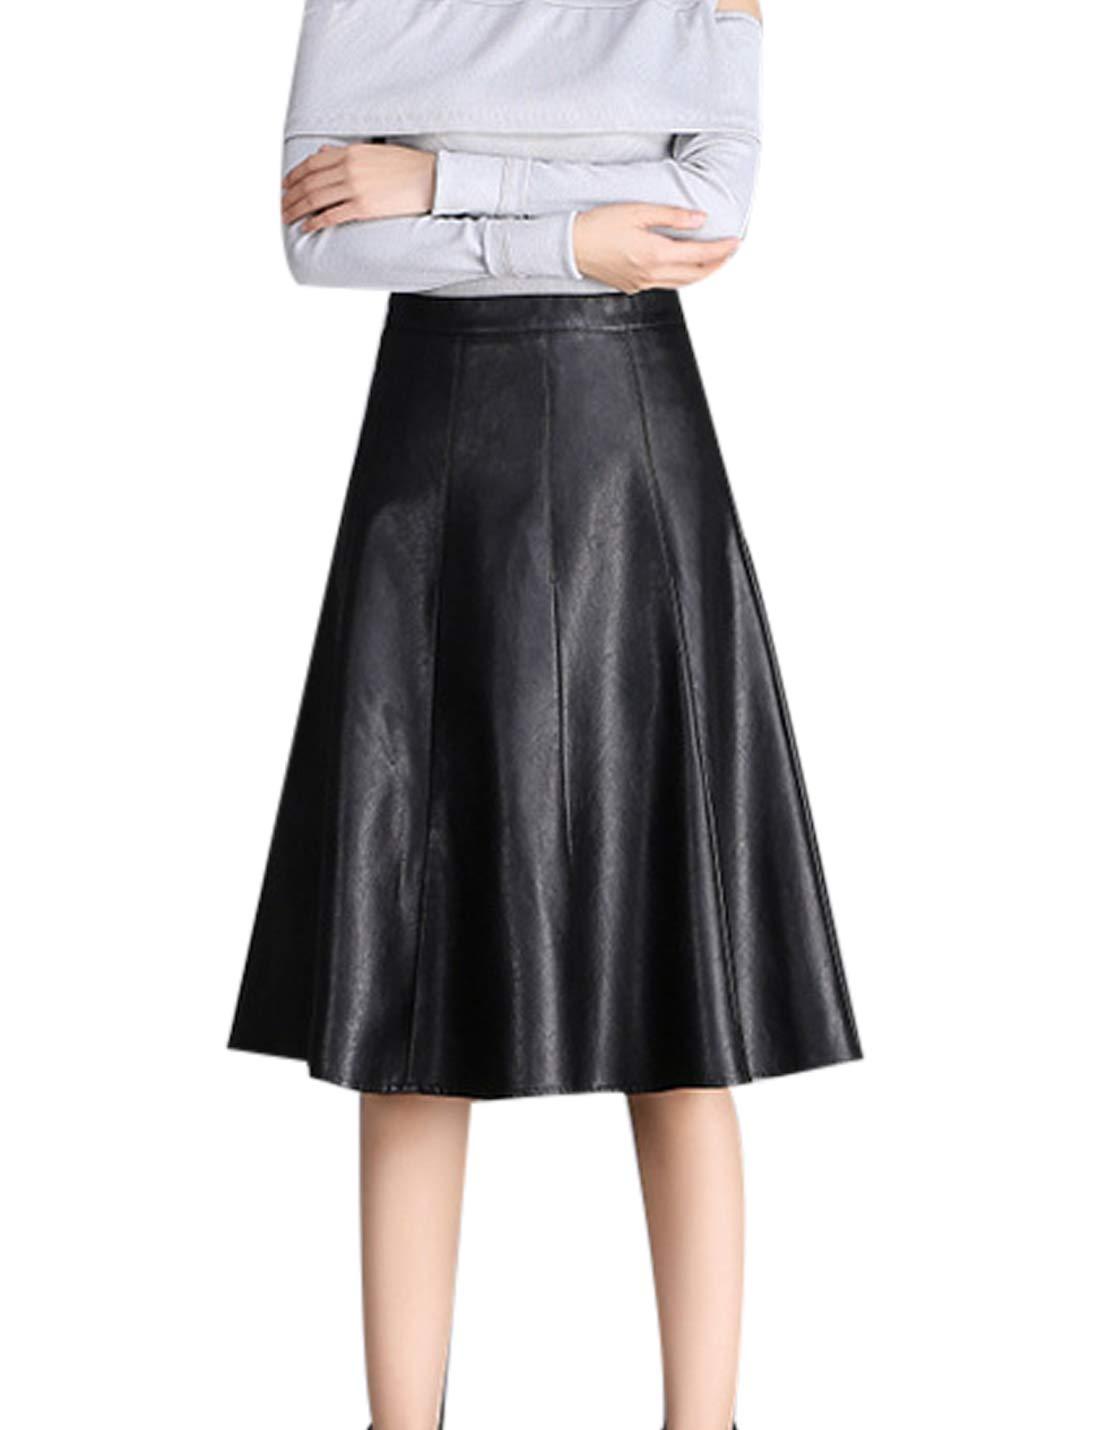 Jenkoon Women's PU Faux Leather Flared High Waist A-Line Swing Skater Skirt (Black, Medium)